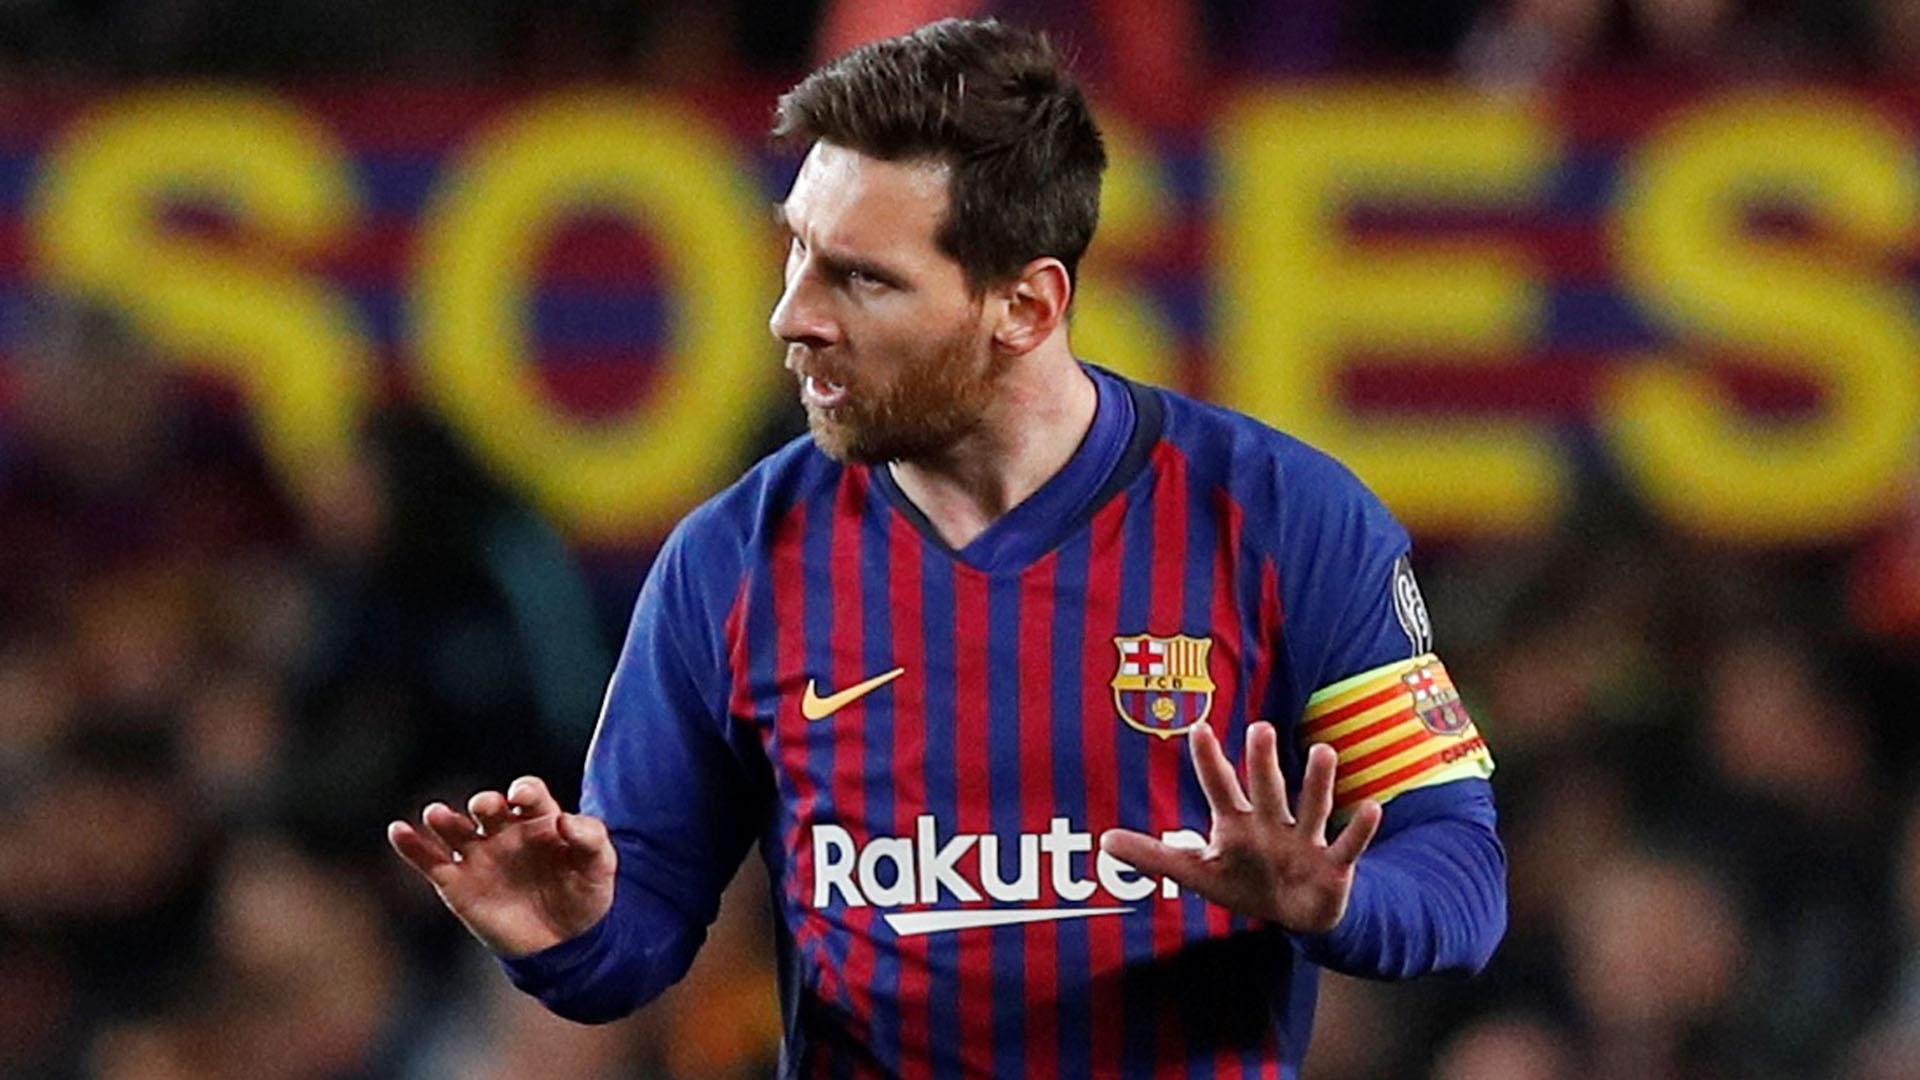 Barcelona goleó 3 a 0 al Manchester United y se clasificó a las semifinales de la Champions League (REUTERS)